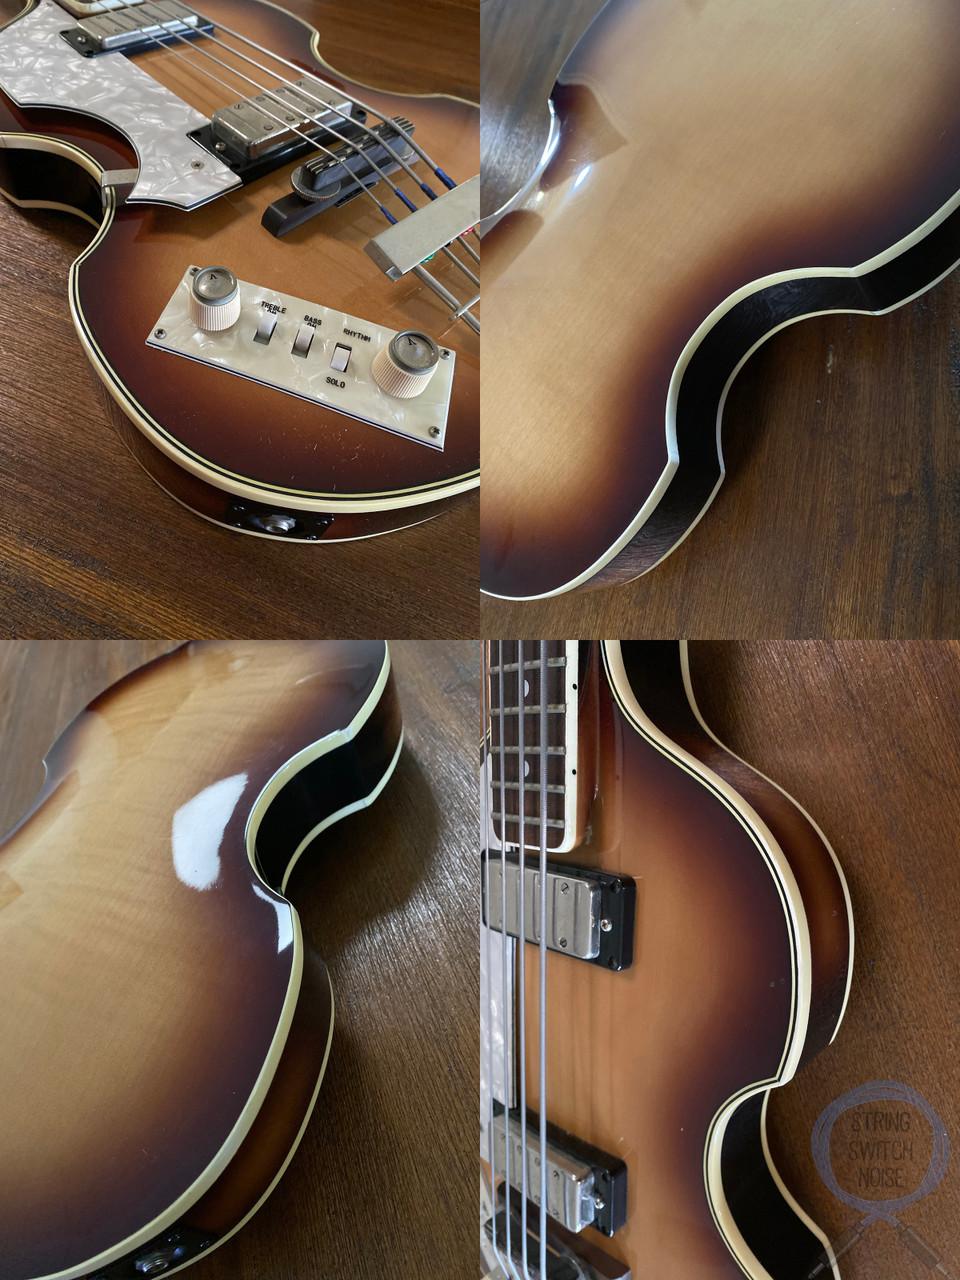 Greco Violin Bass, LEFT HAND, Sunburst, 1982, Paul McCartney, OHSC